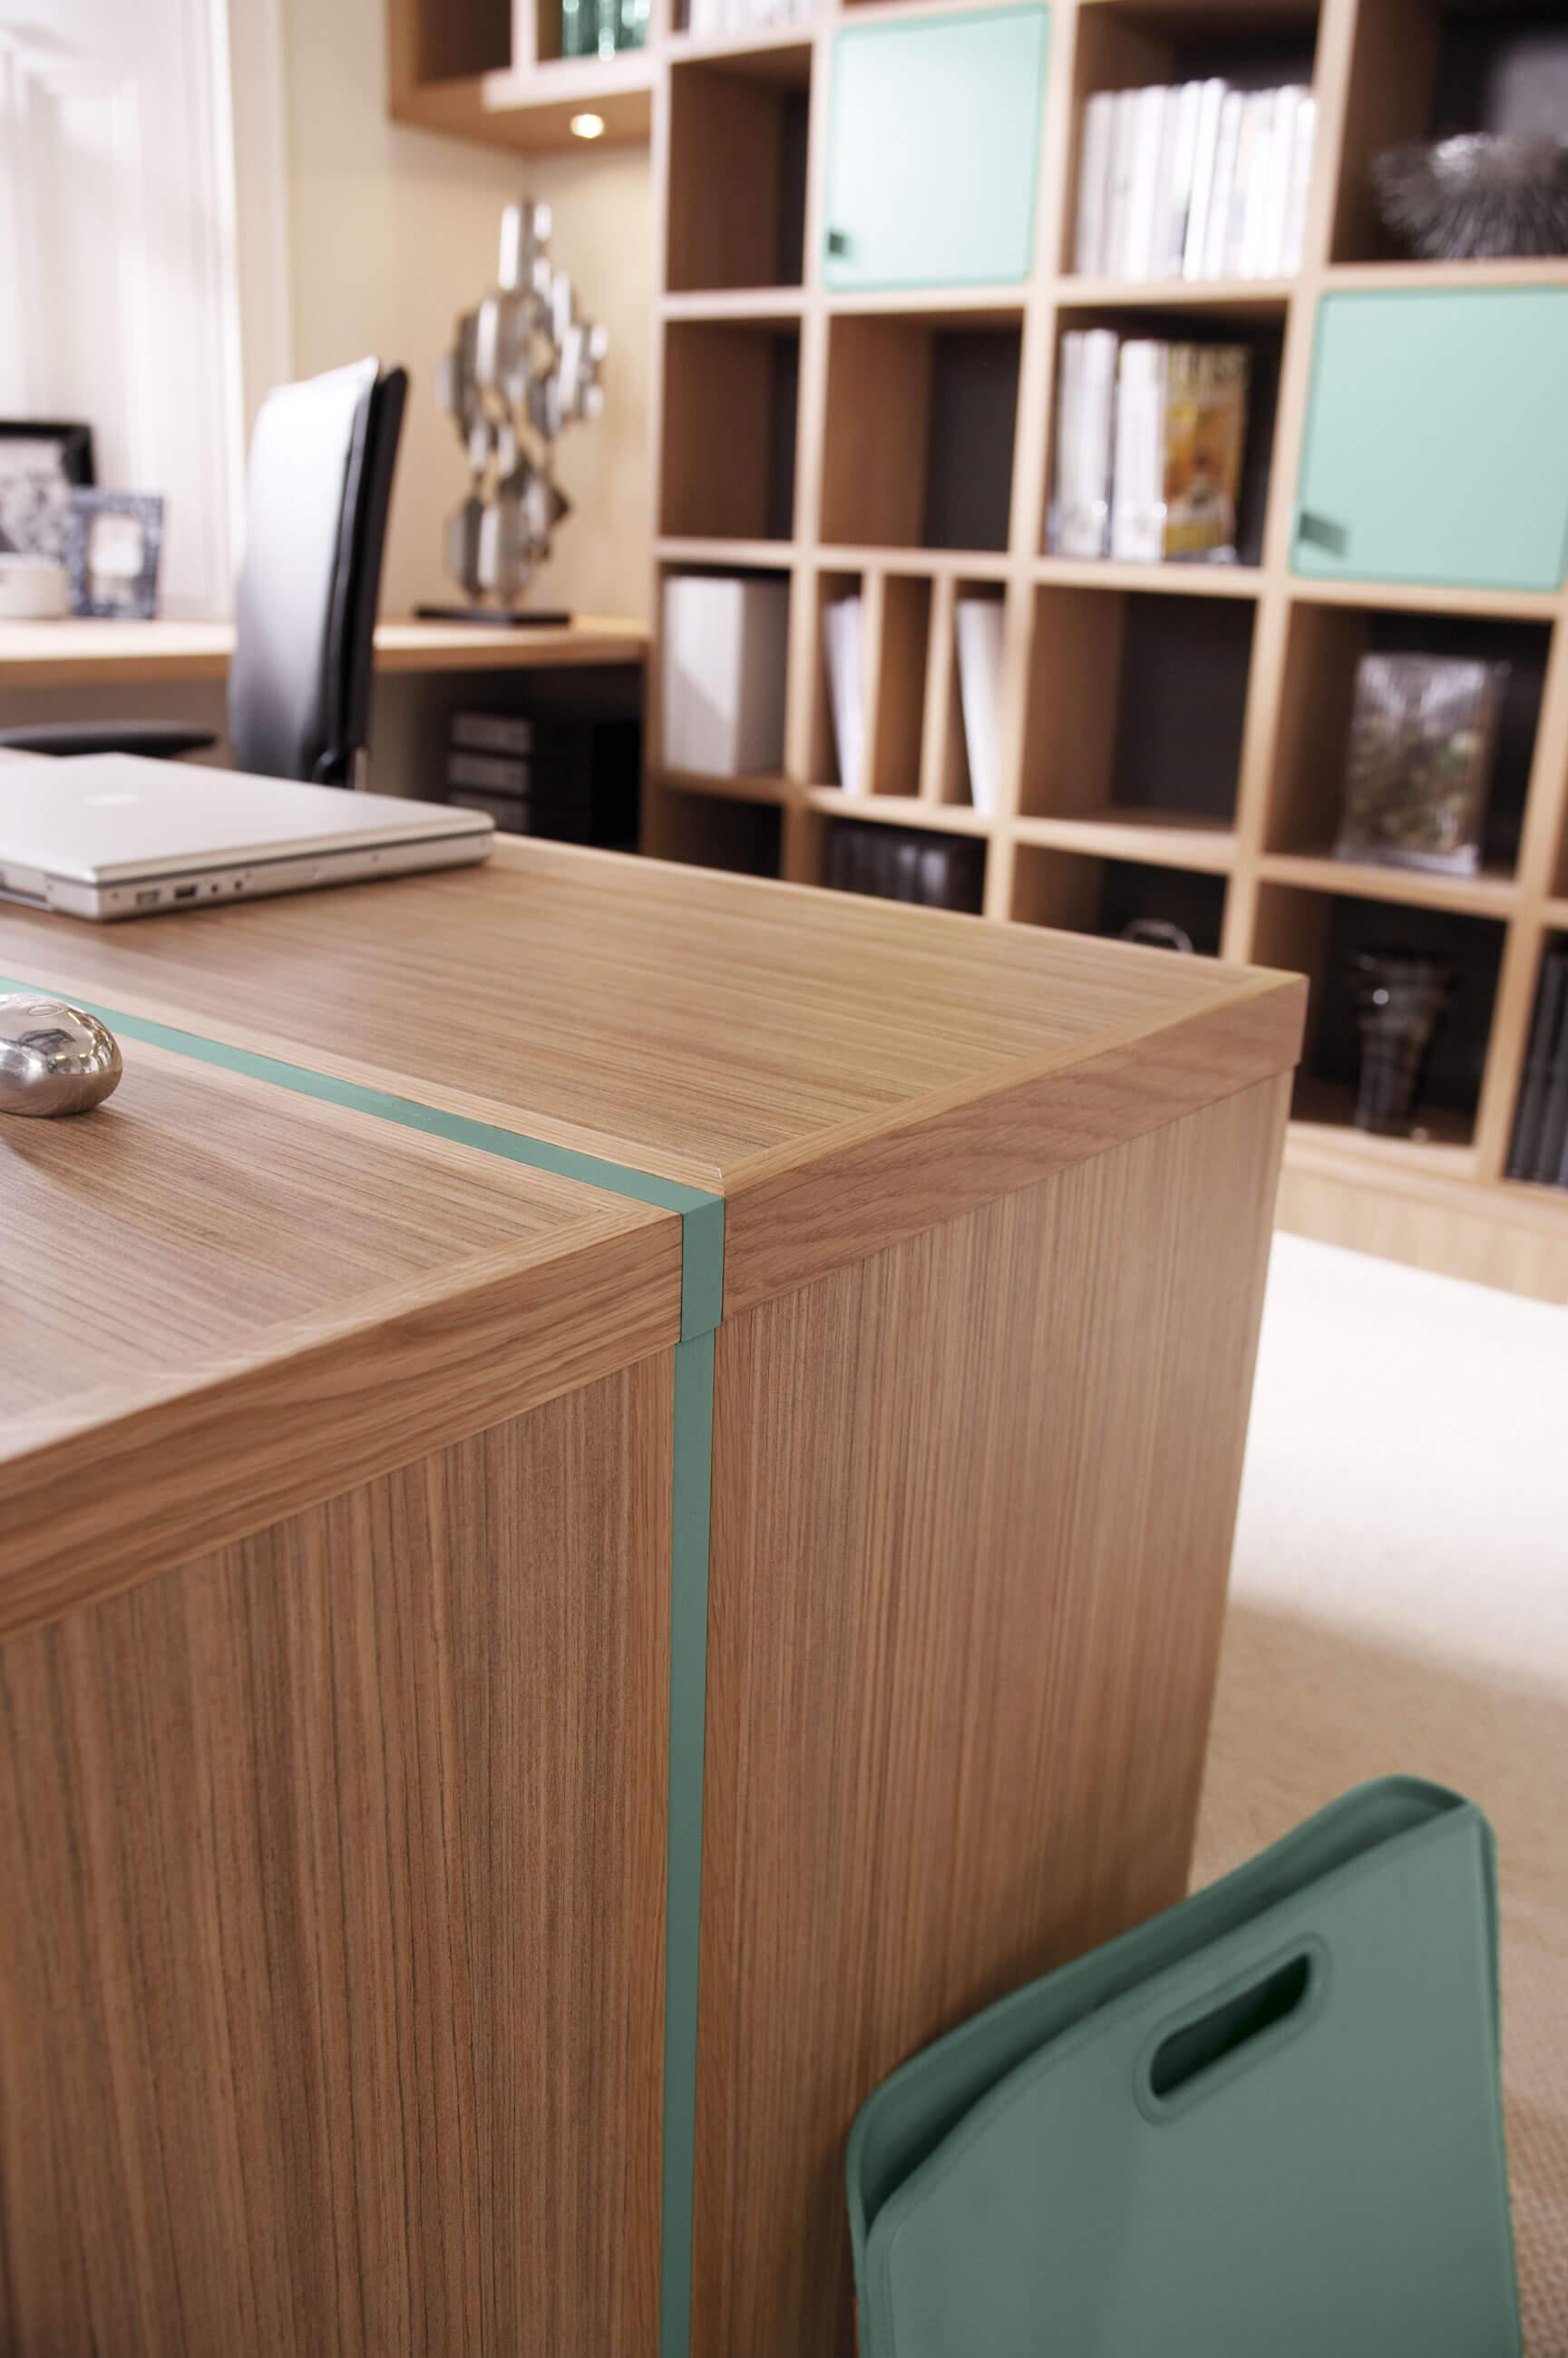 study furniture design. Go To Previous Slide. Next View All Images Study Furniture Design R